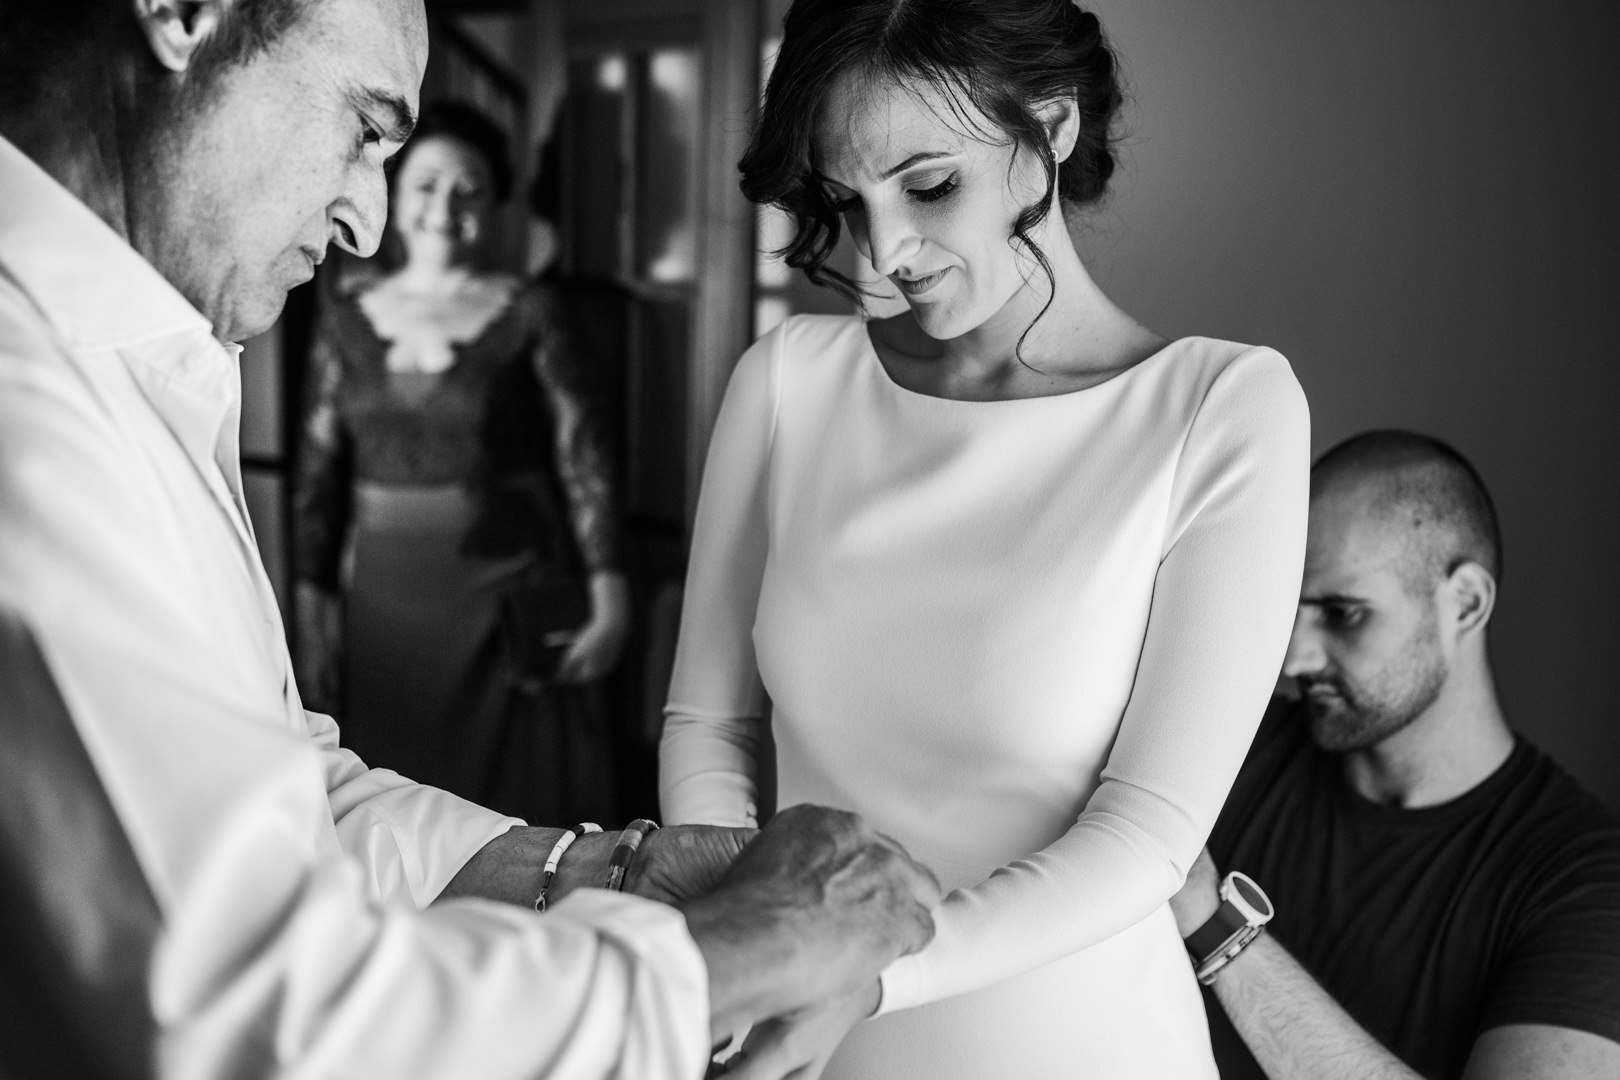 Boda-Irene-Marcos-Dos-Hermanas-Finca-Clotidle-engagement-Rafael-Torres-fotografo-bodas-sevilla-madrid-barcelona-wedding-photographer--11.jpg